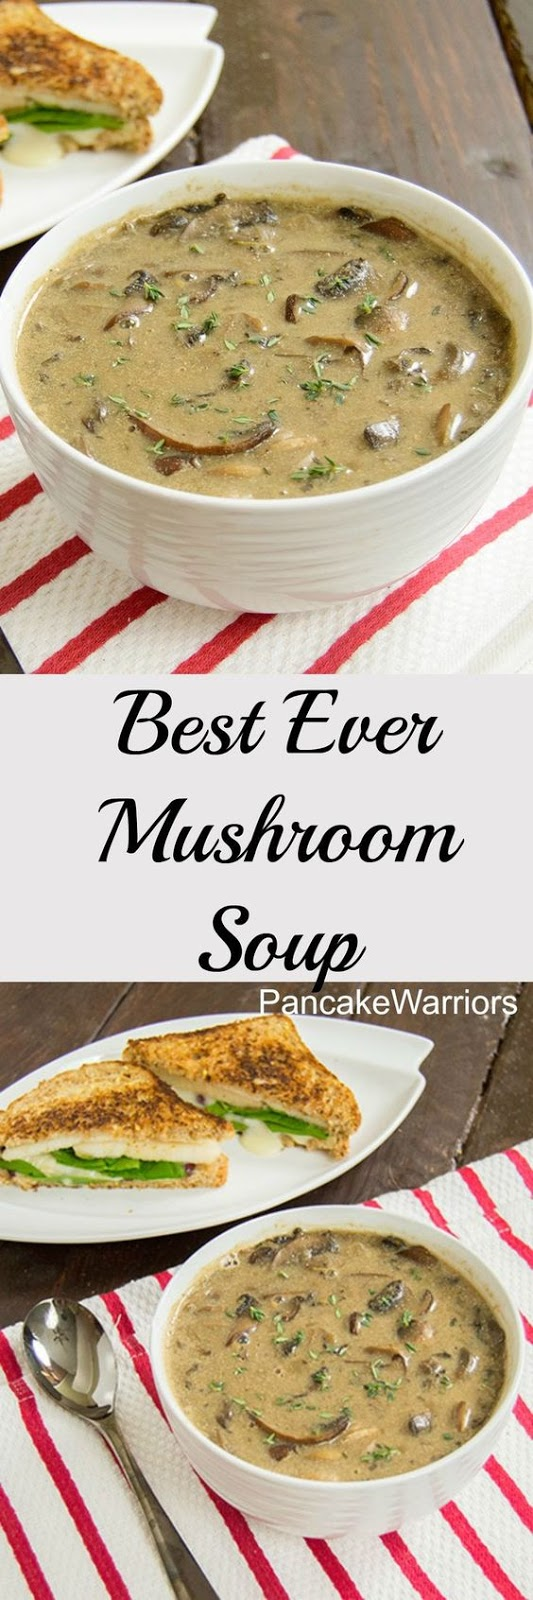 Best Ever Mushroom Soup - low fat, vegan, gluten free creamy mushroom soup. #vegan #glutenfree